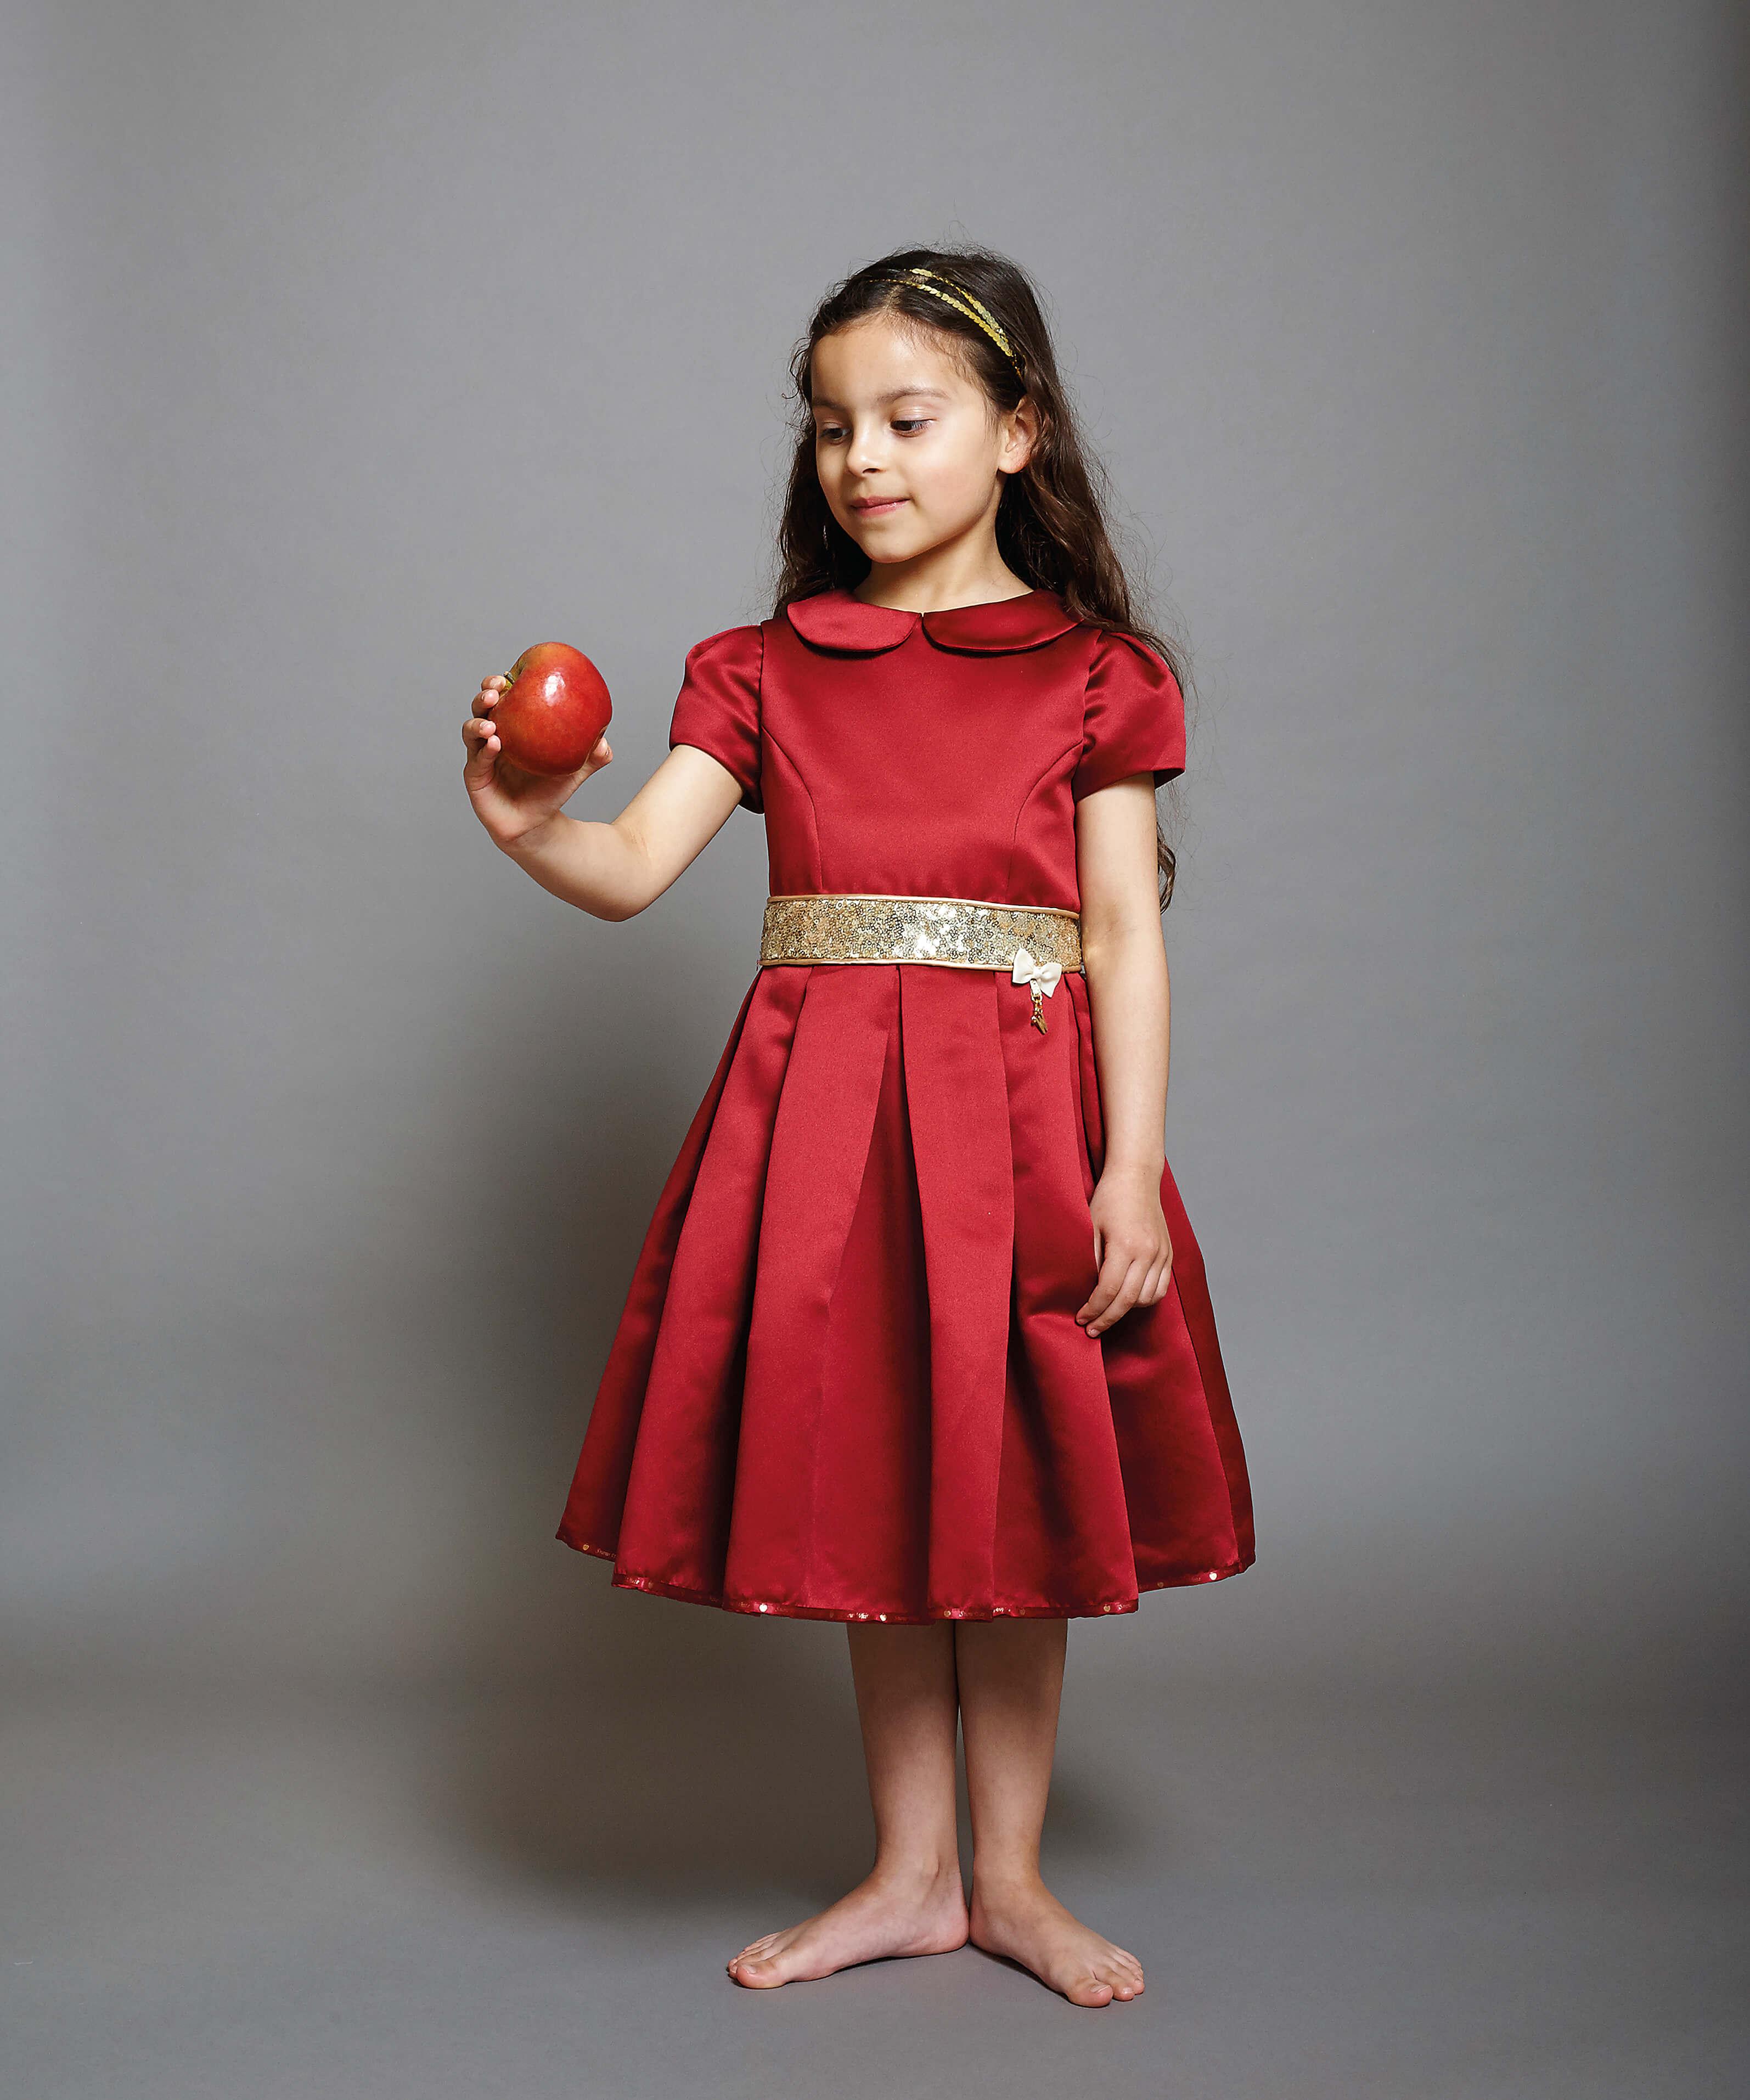 Disney Boutique Girls Snow White Red duchess satin & gold Dress